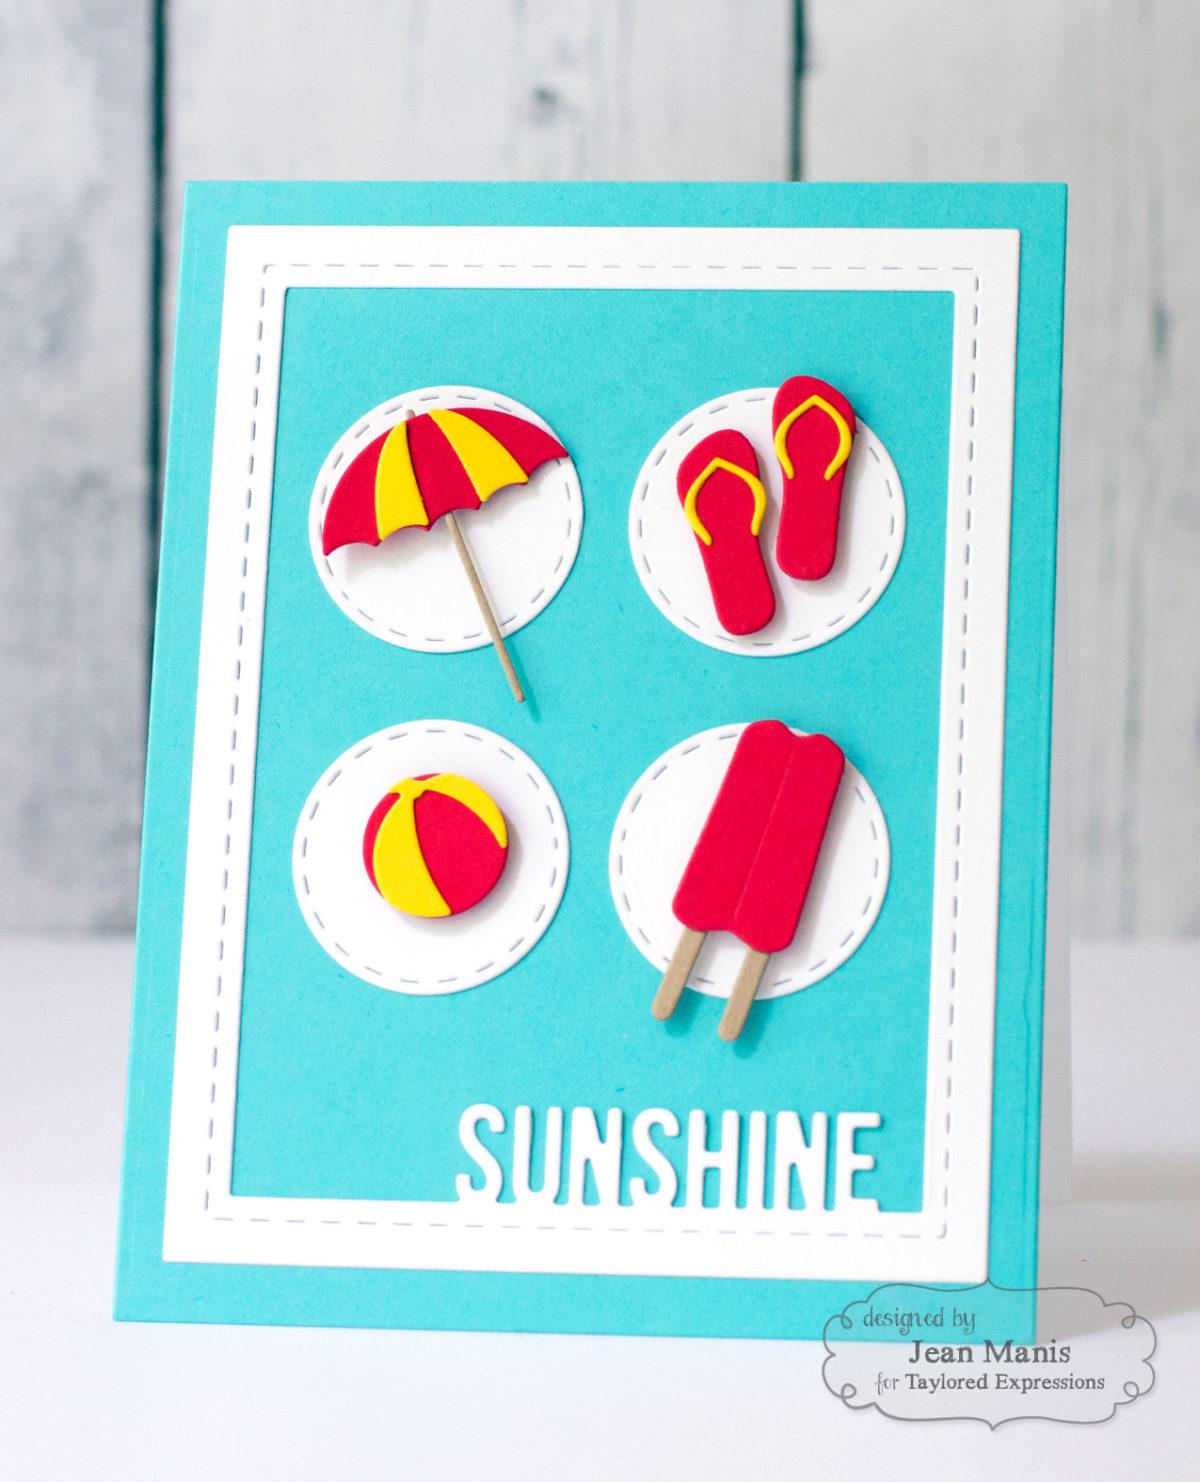 Sunny Summer Days – TE Share Joy Challenge #42